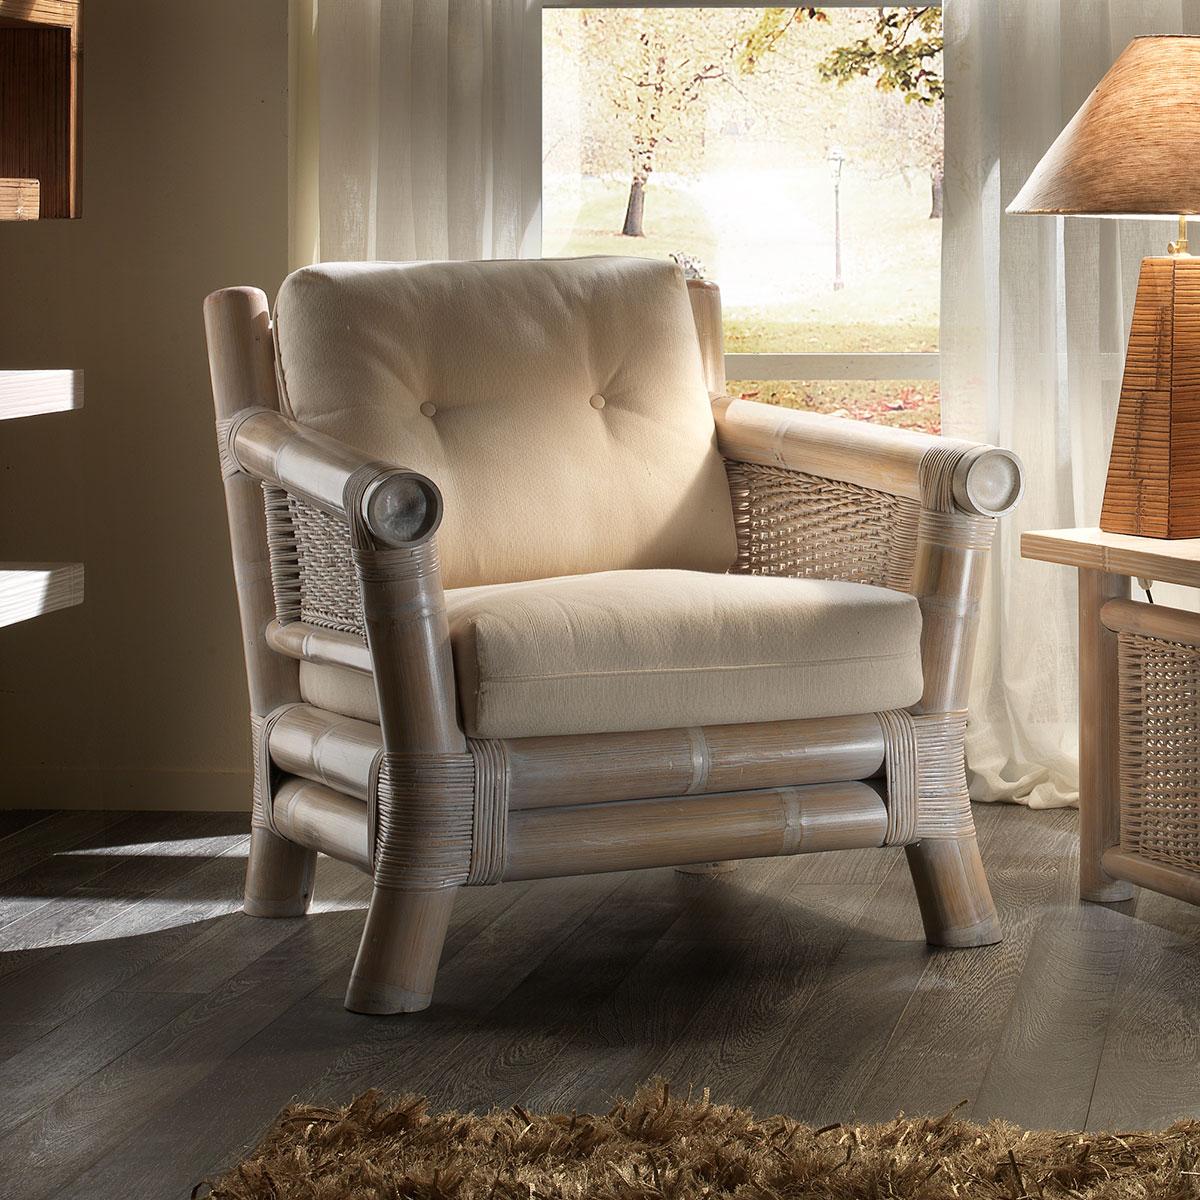 fauteuil bambou crus image 1 - Fauteuil Bambou